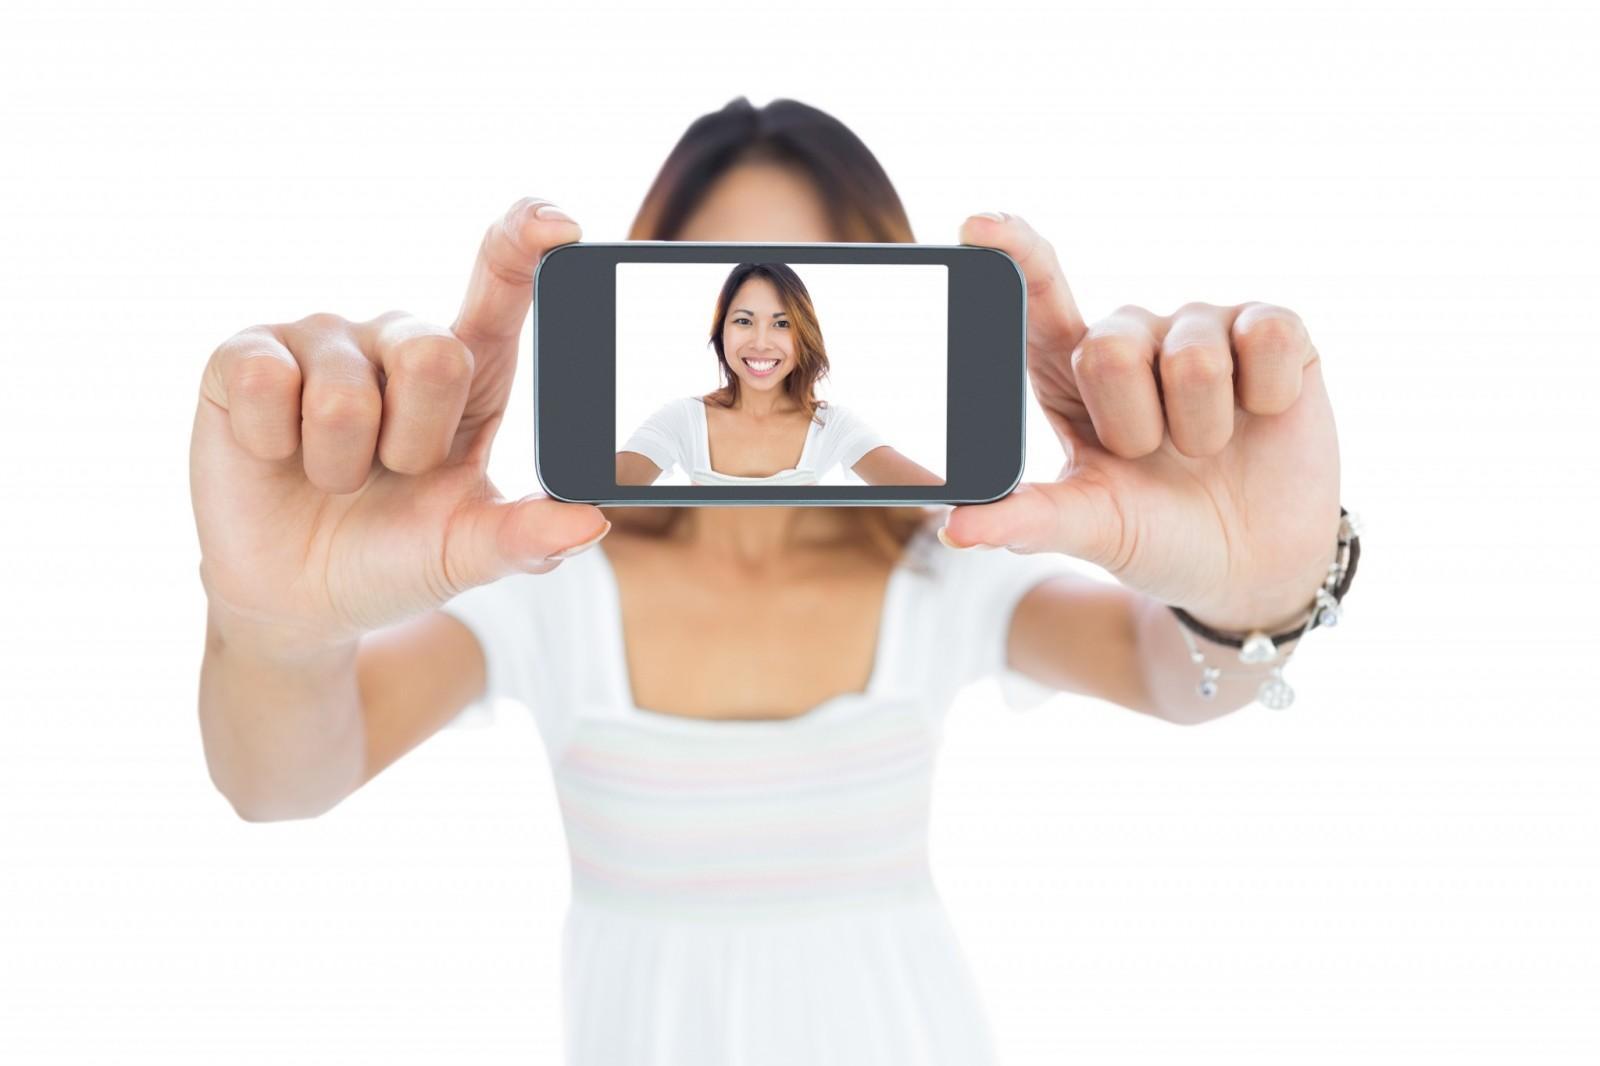 Selfie image via Shutterstock.com